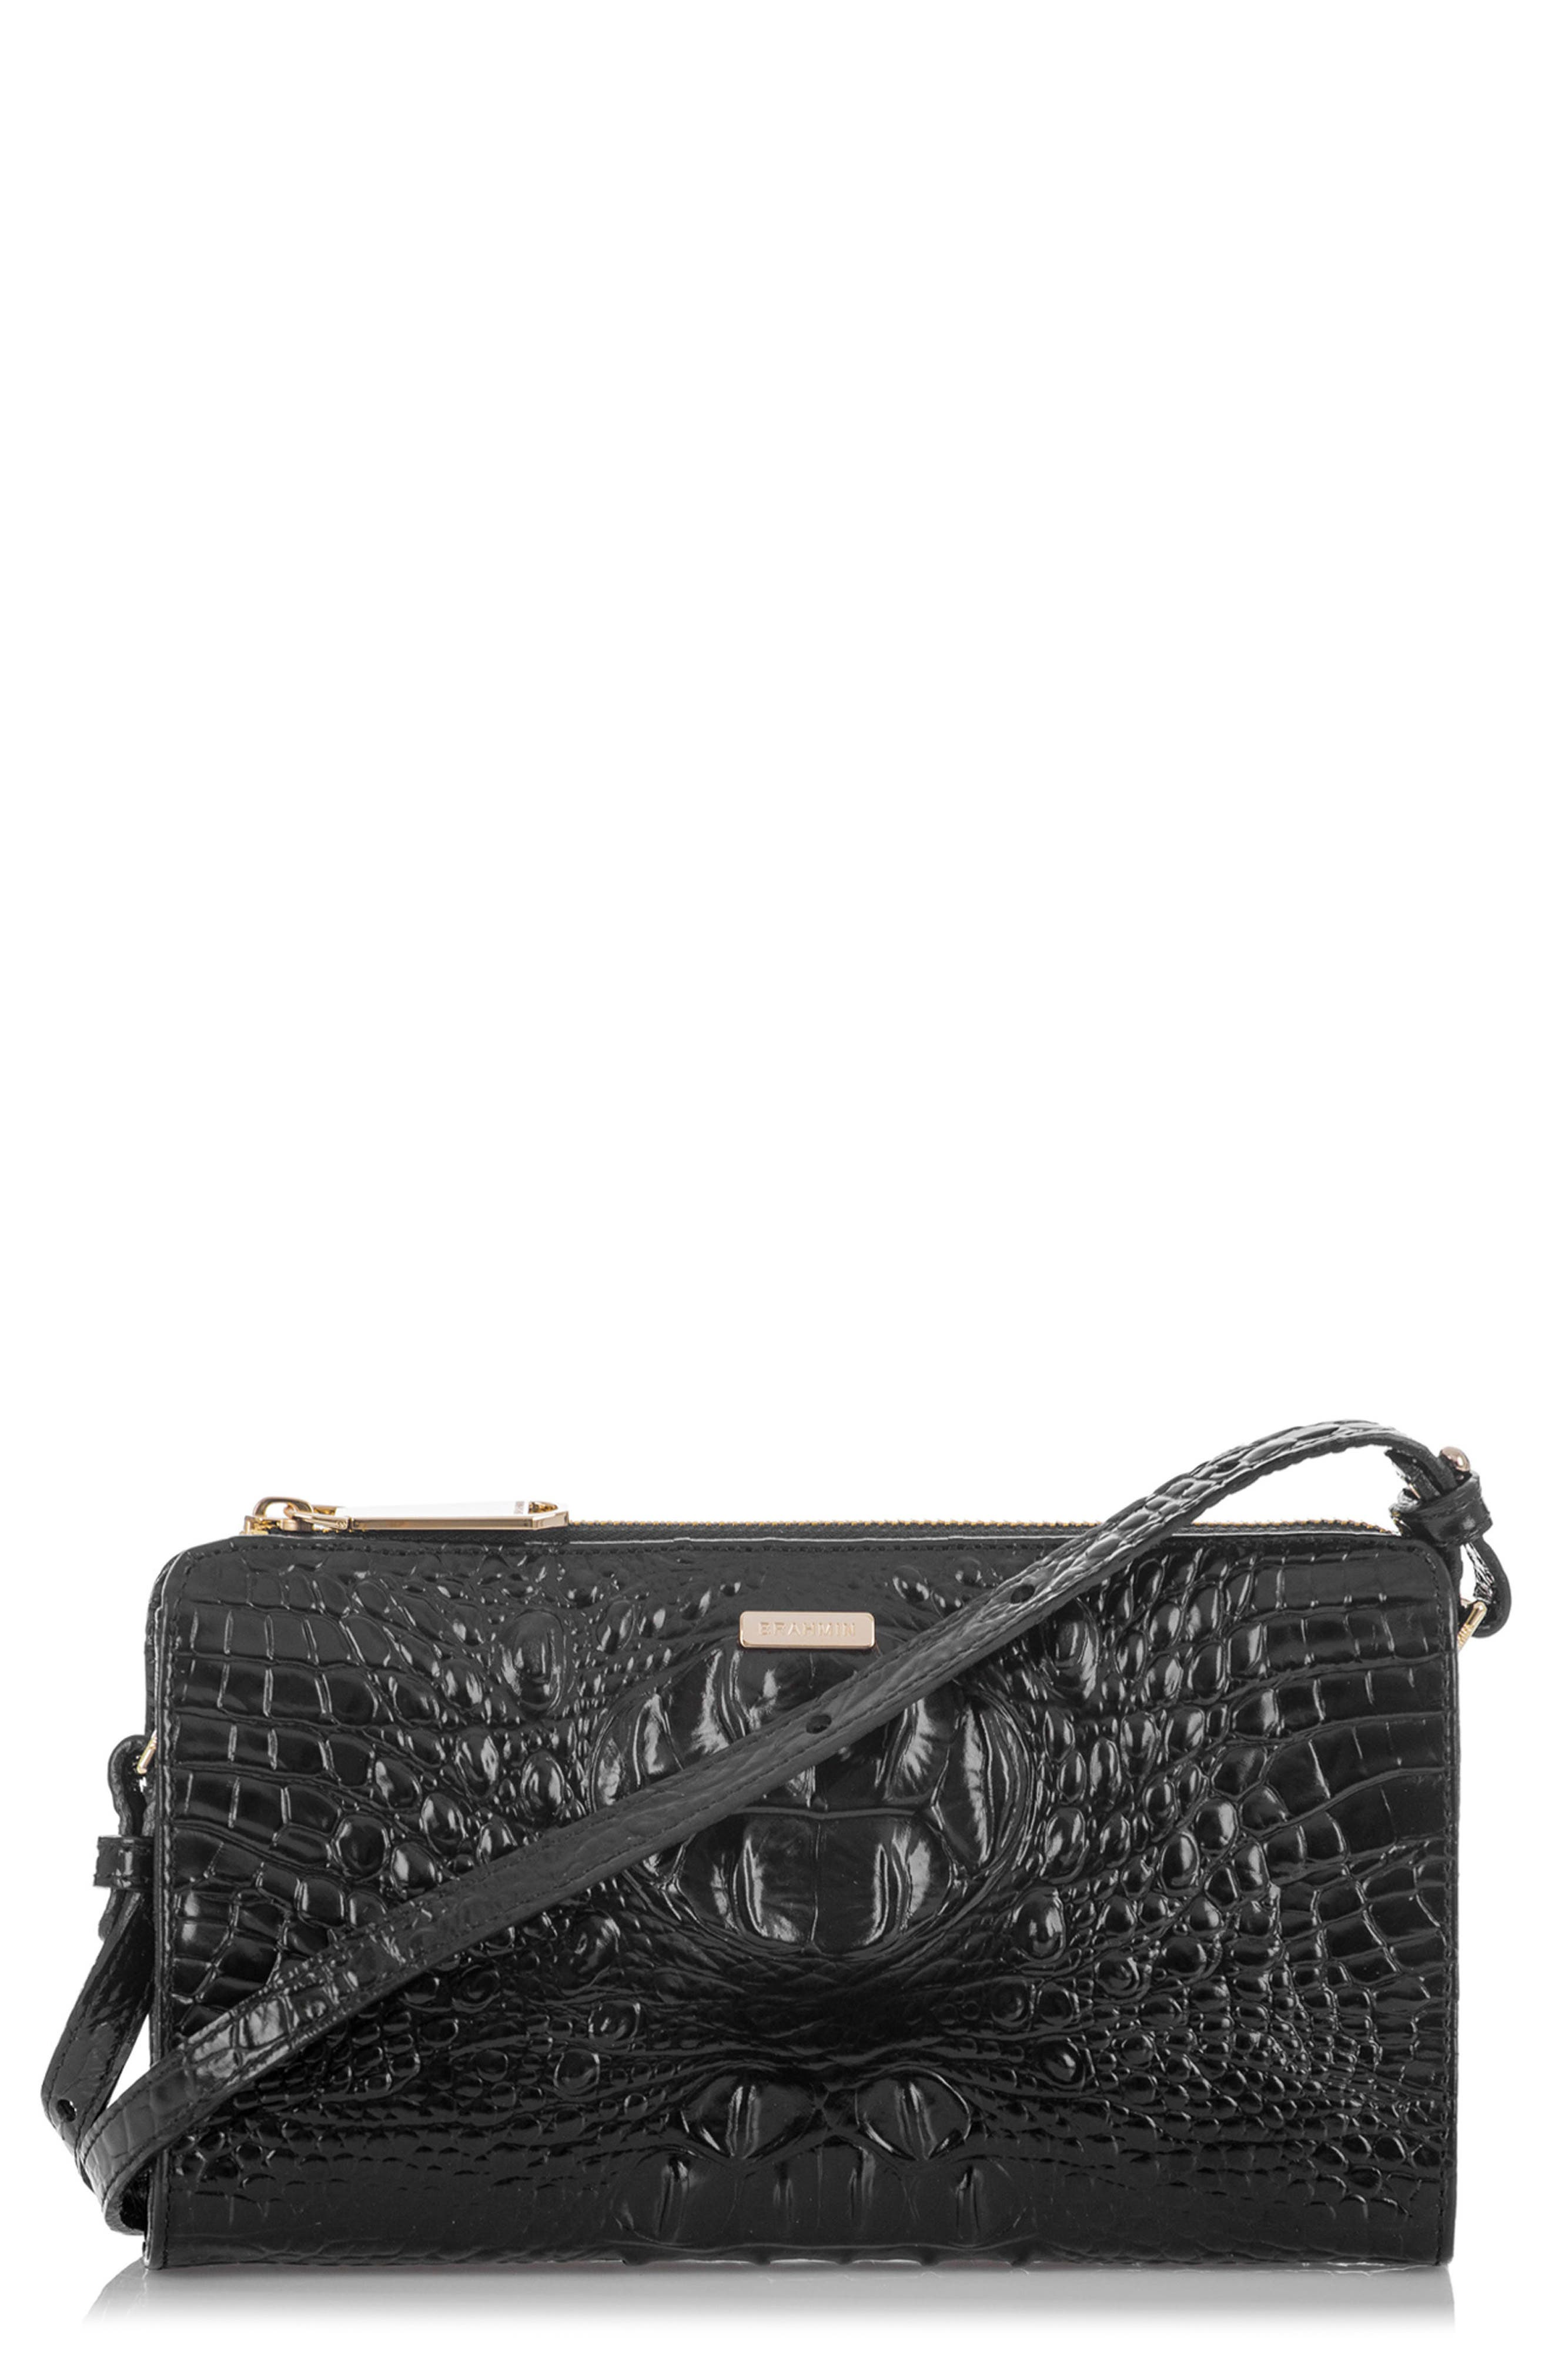 Sienna Leather Crossbody Bag,                         Main,                         color, 001